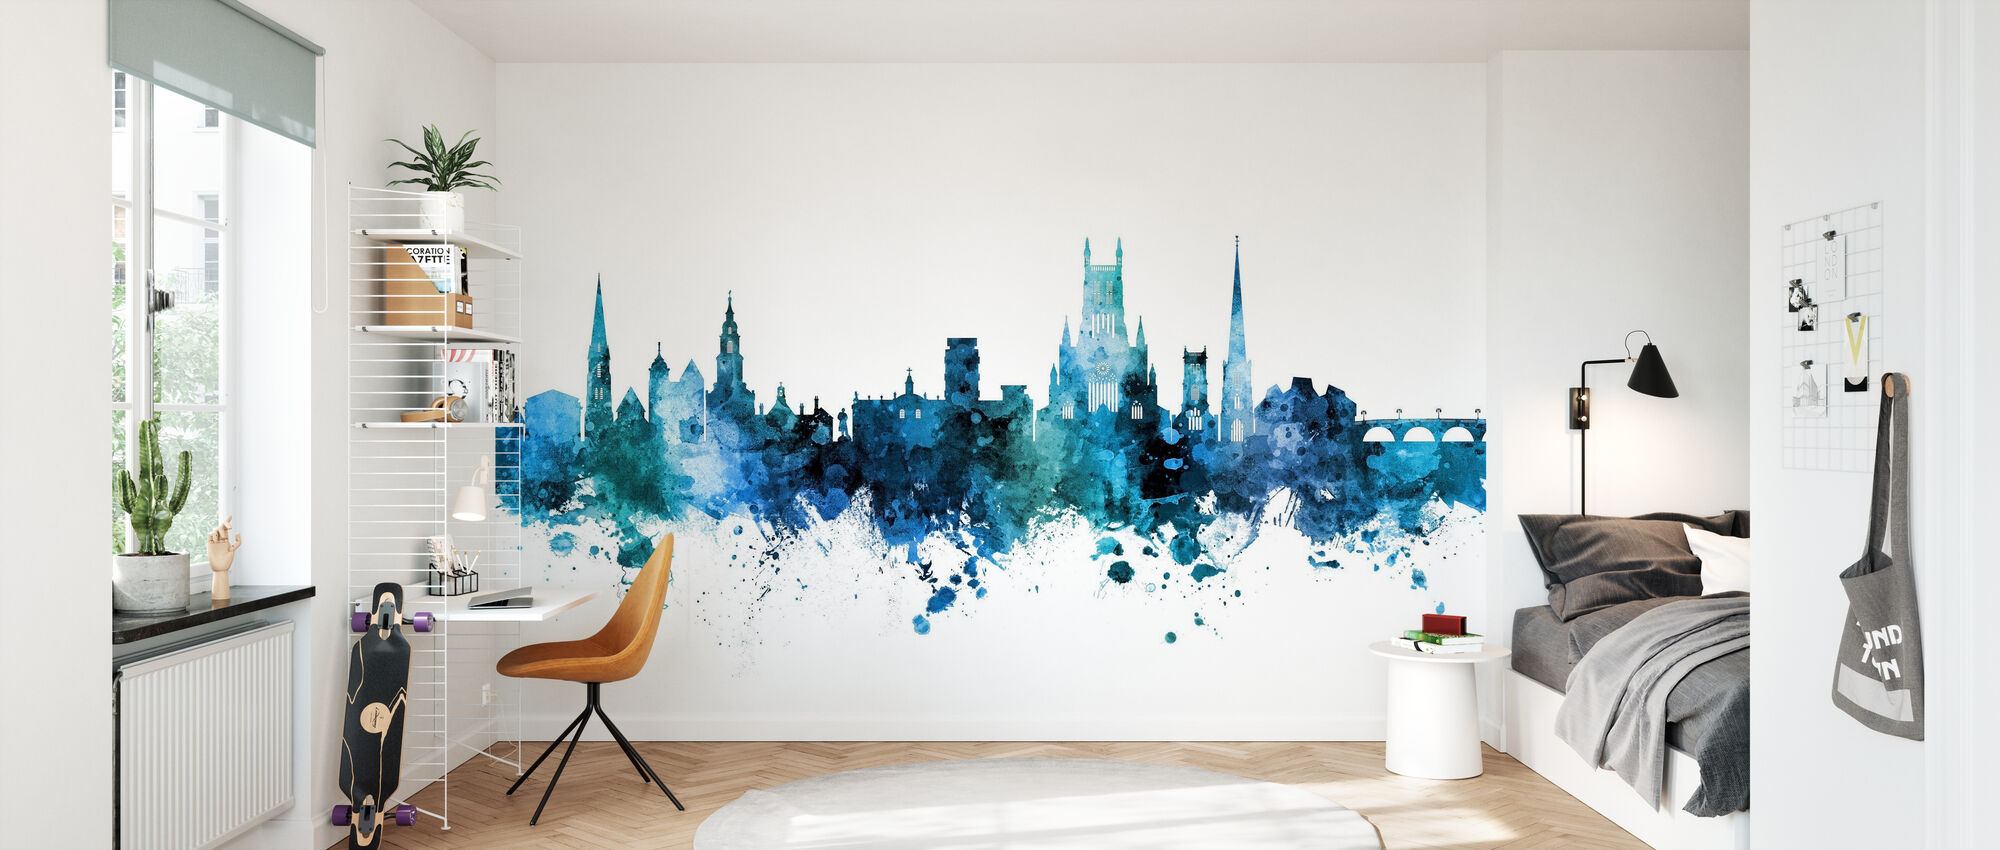 Worcester England Skyline - Wallpaper - Kids Room